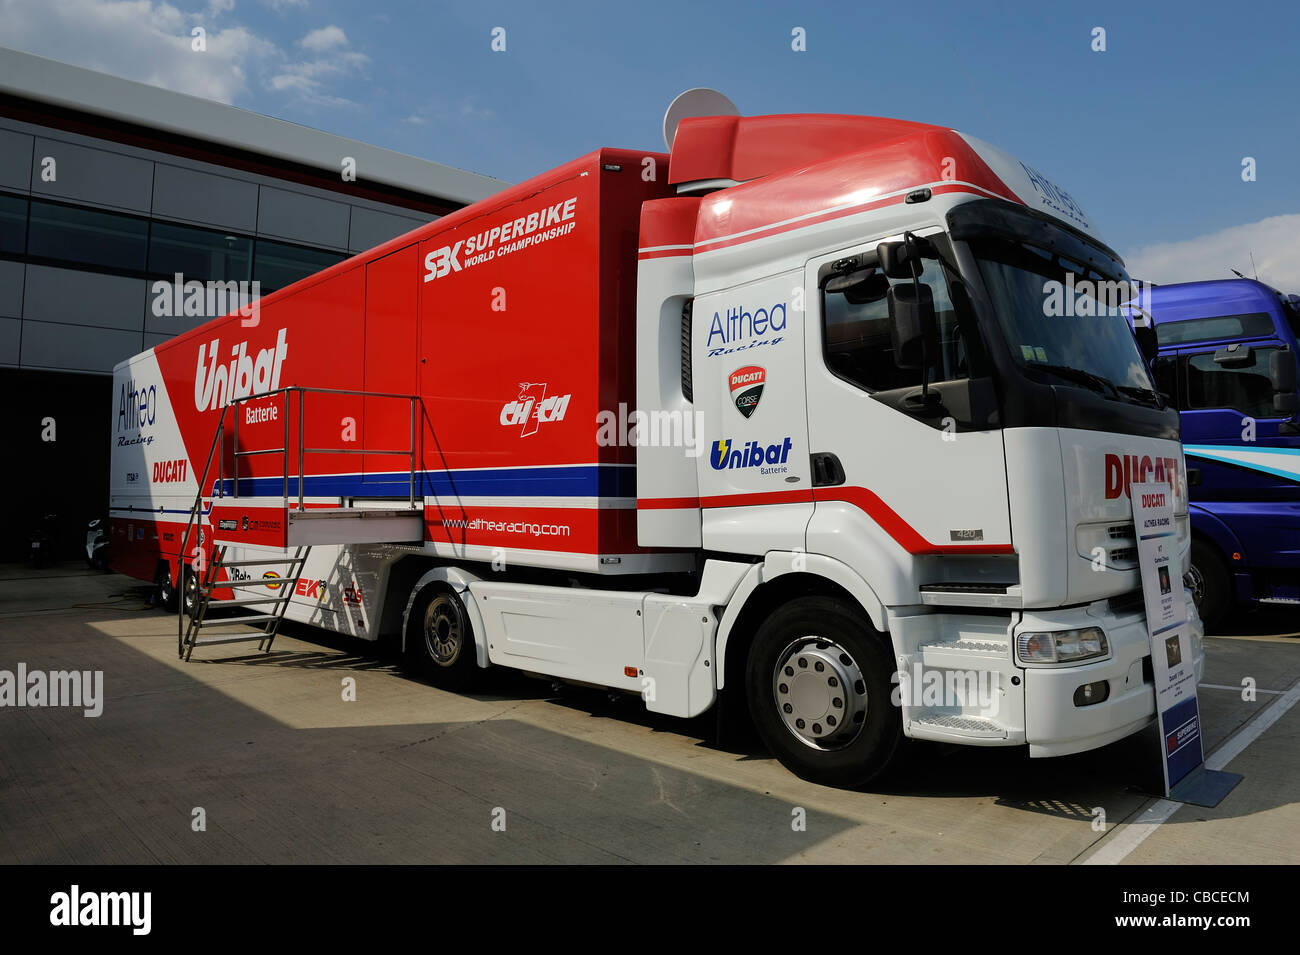 althea ducati superbike transporter in the paddock Stock Photo